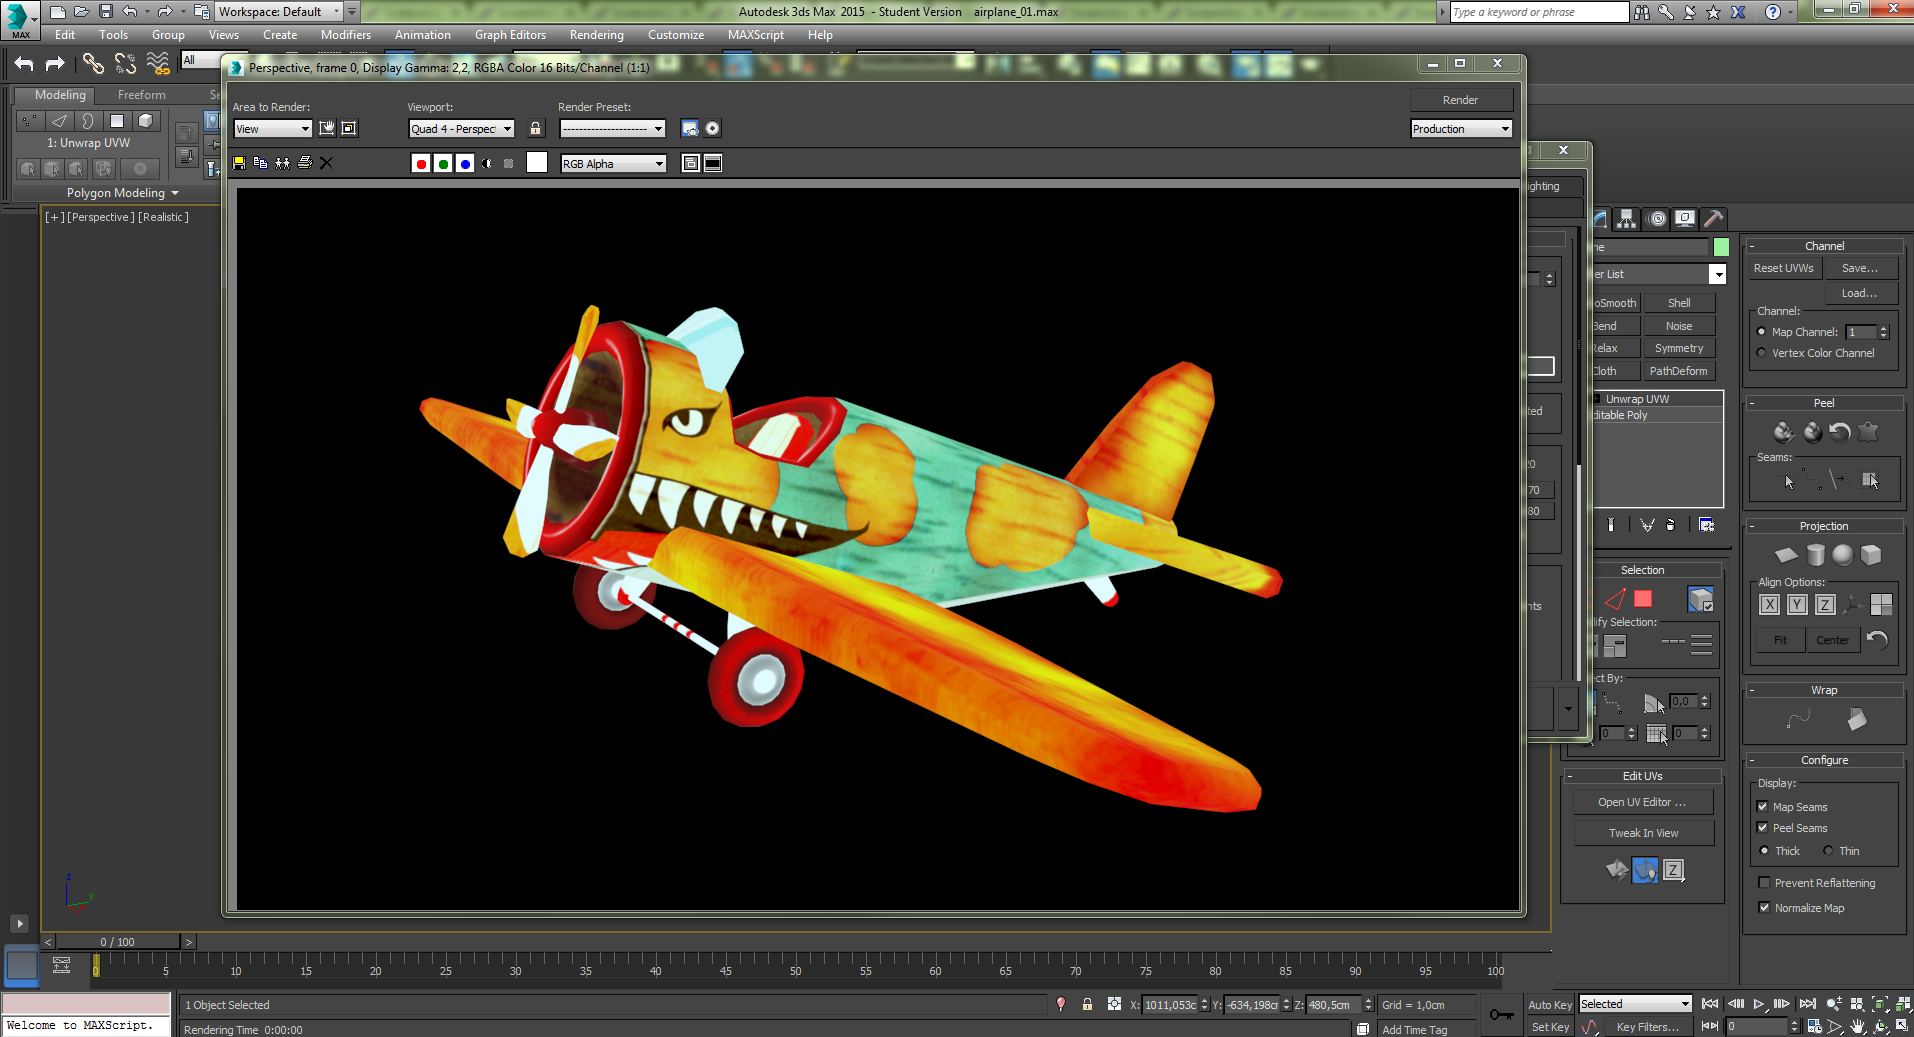 avion texture 3d 3dsmax